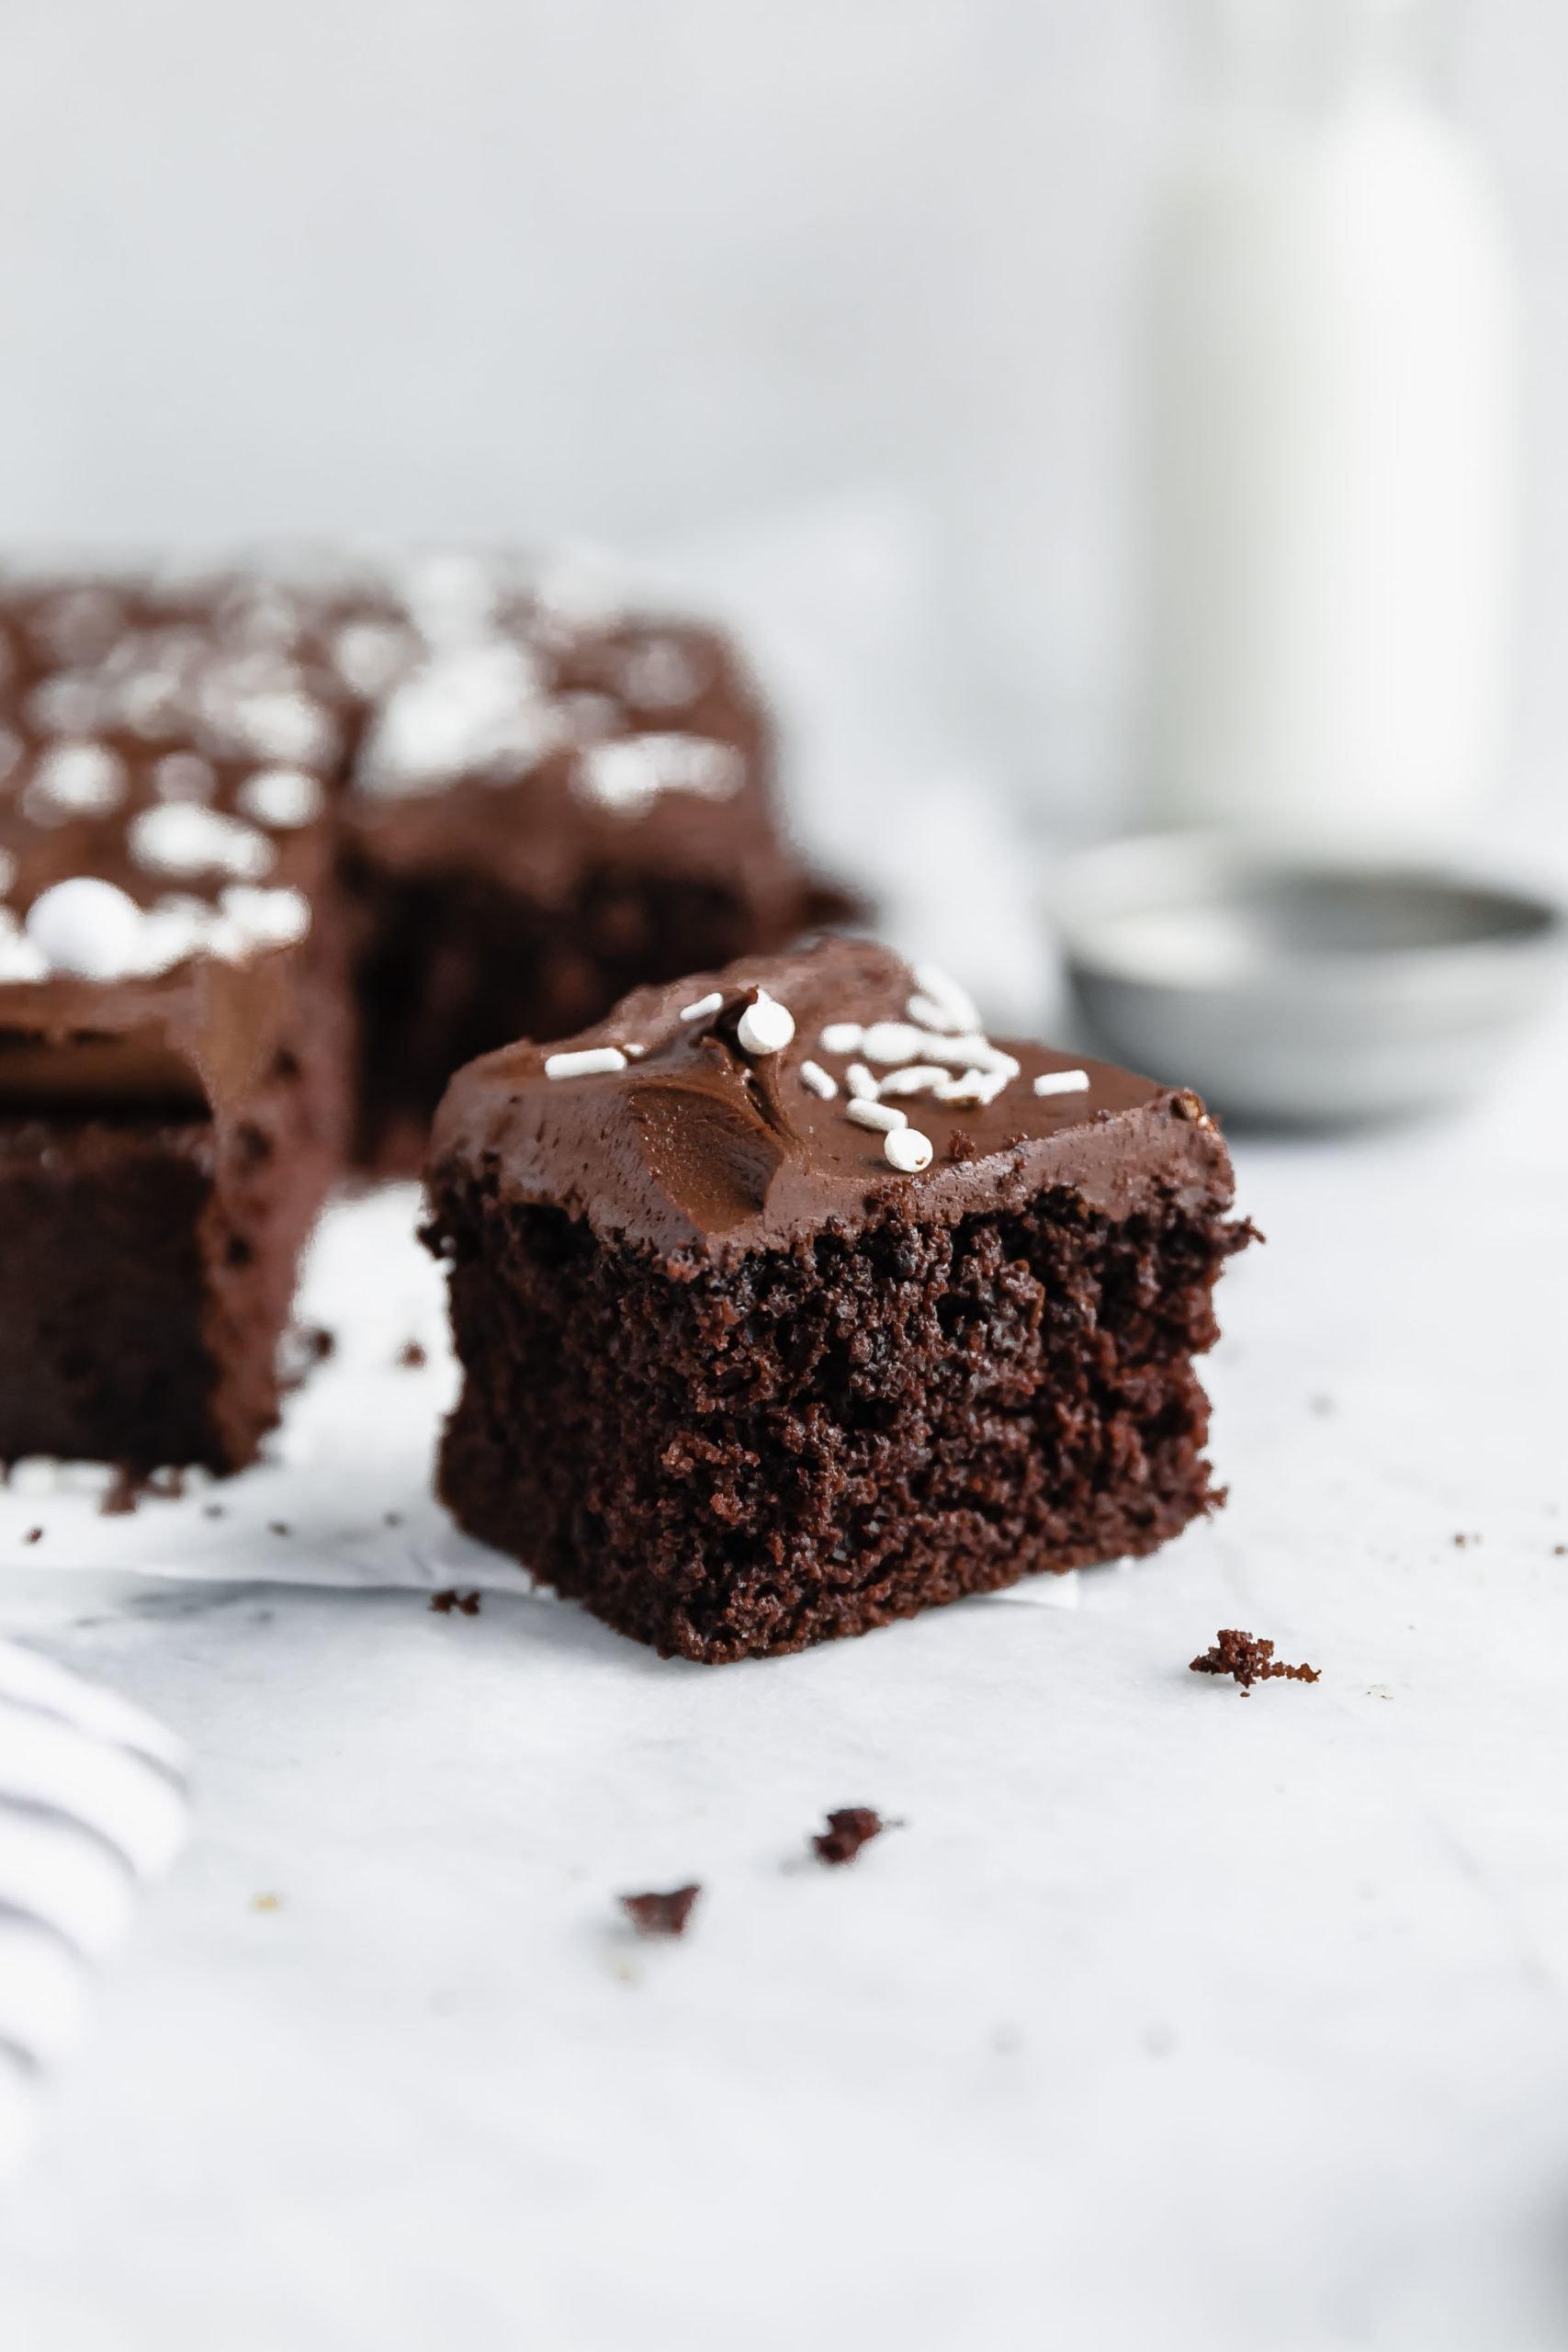 gluten free chocolate cake slice with decadent chocolate buttercream